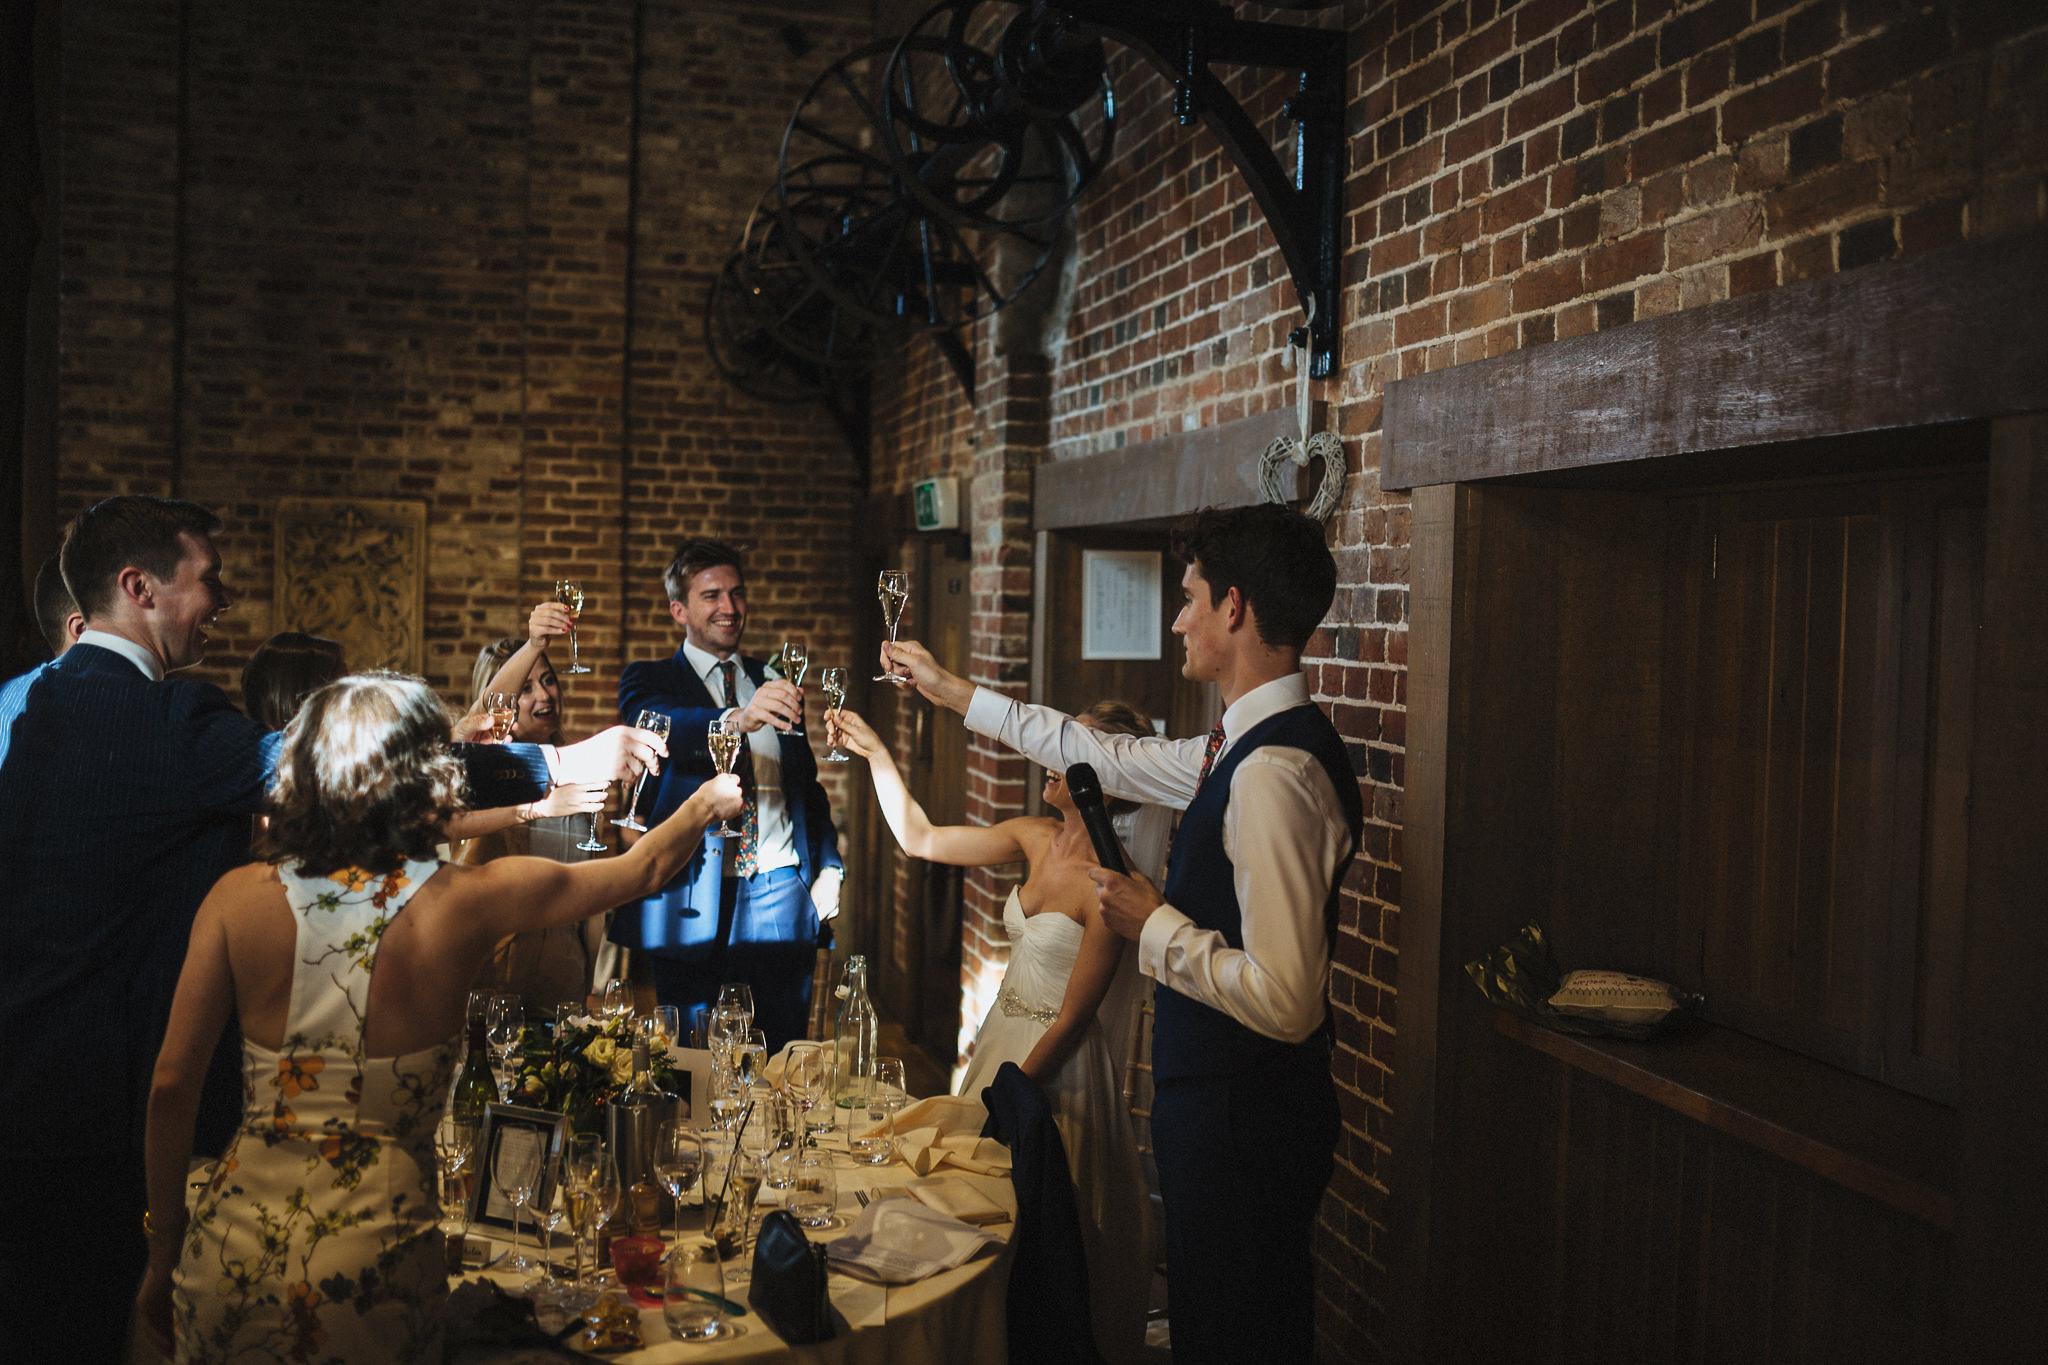 paul-marbrook-Gaynes-Park Wedding-Photographer-90115